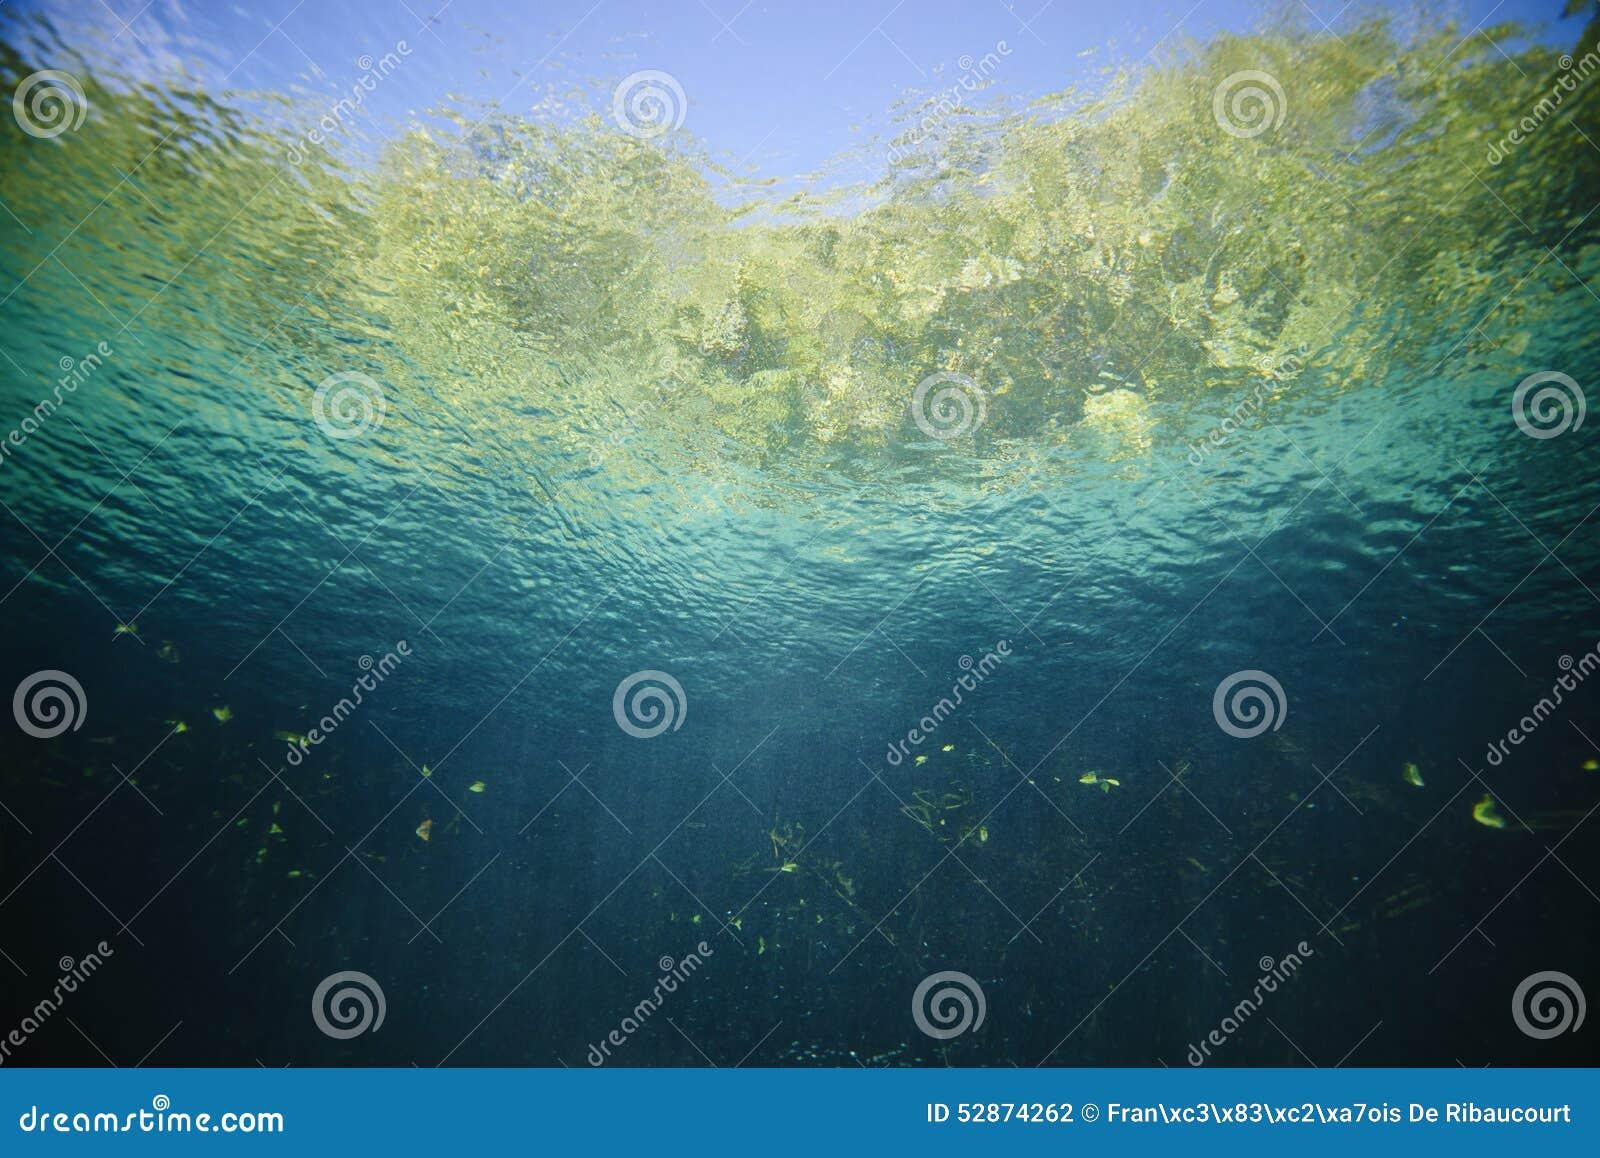 Korala ryba krajobrazu rafy tropikalny underwater